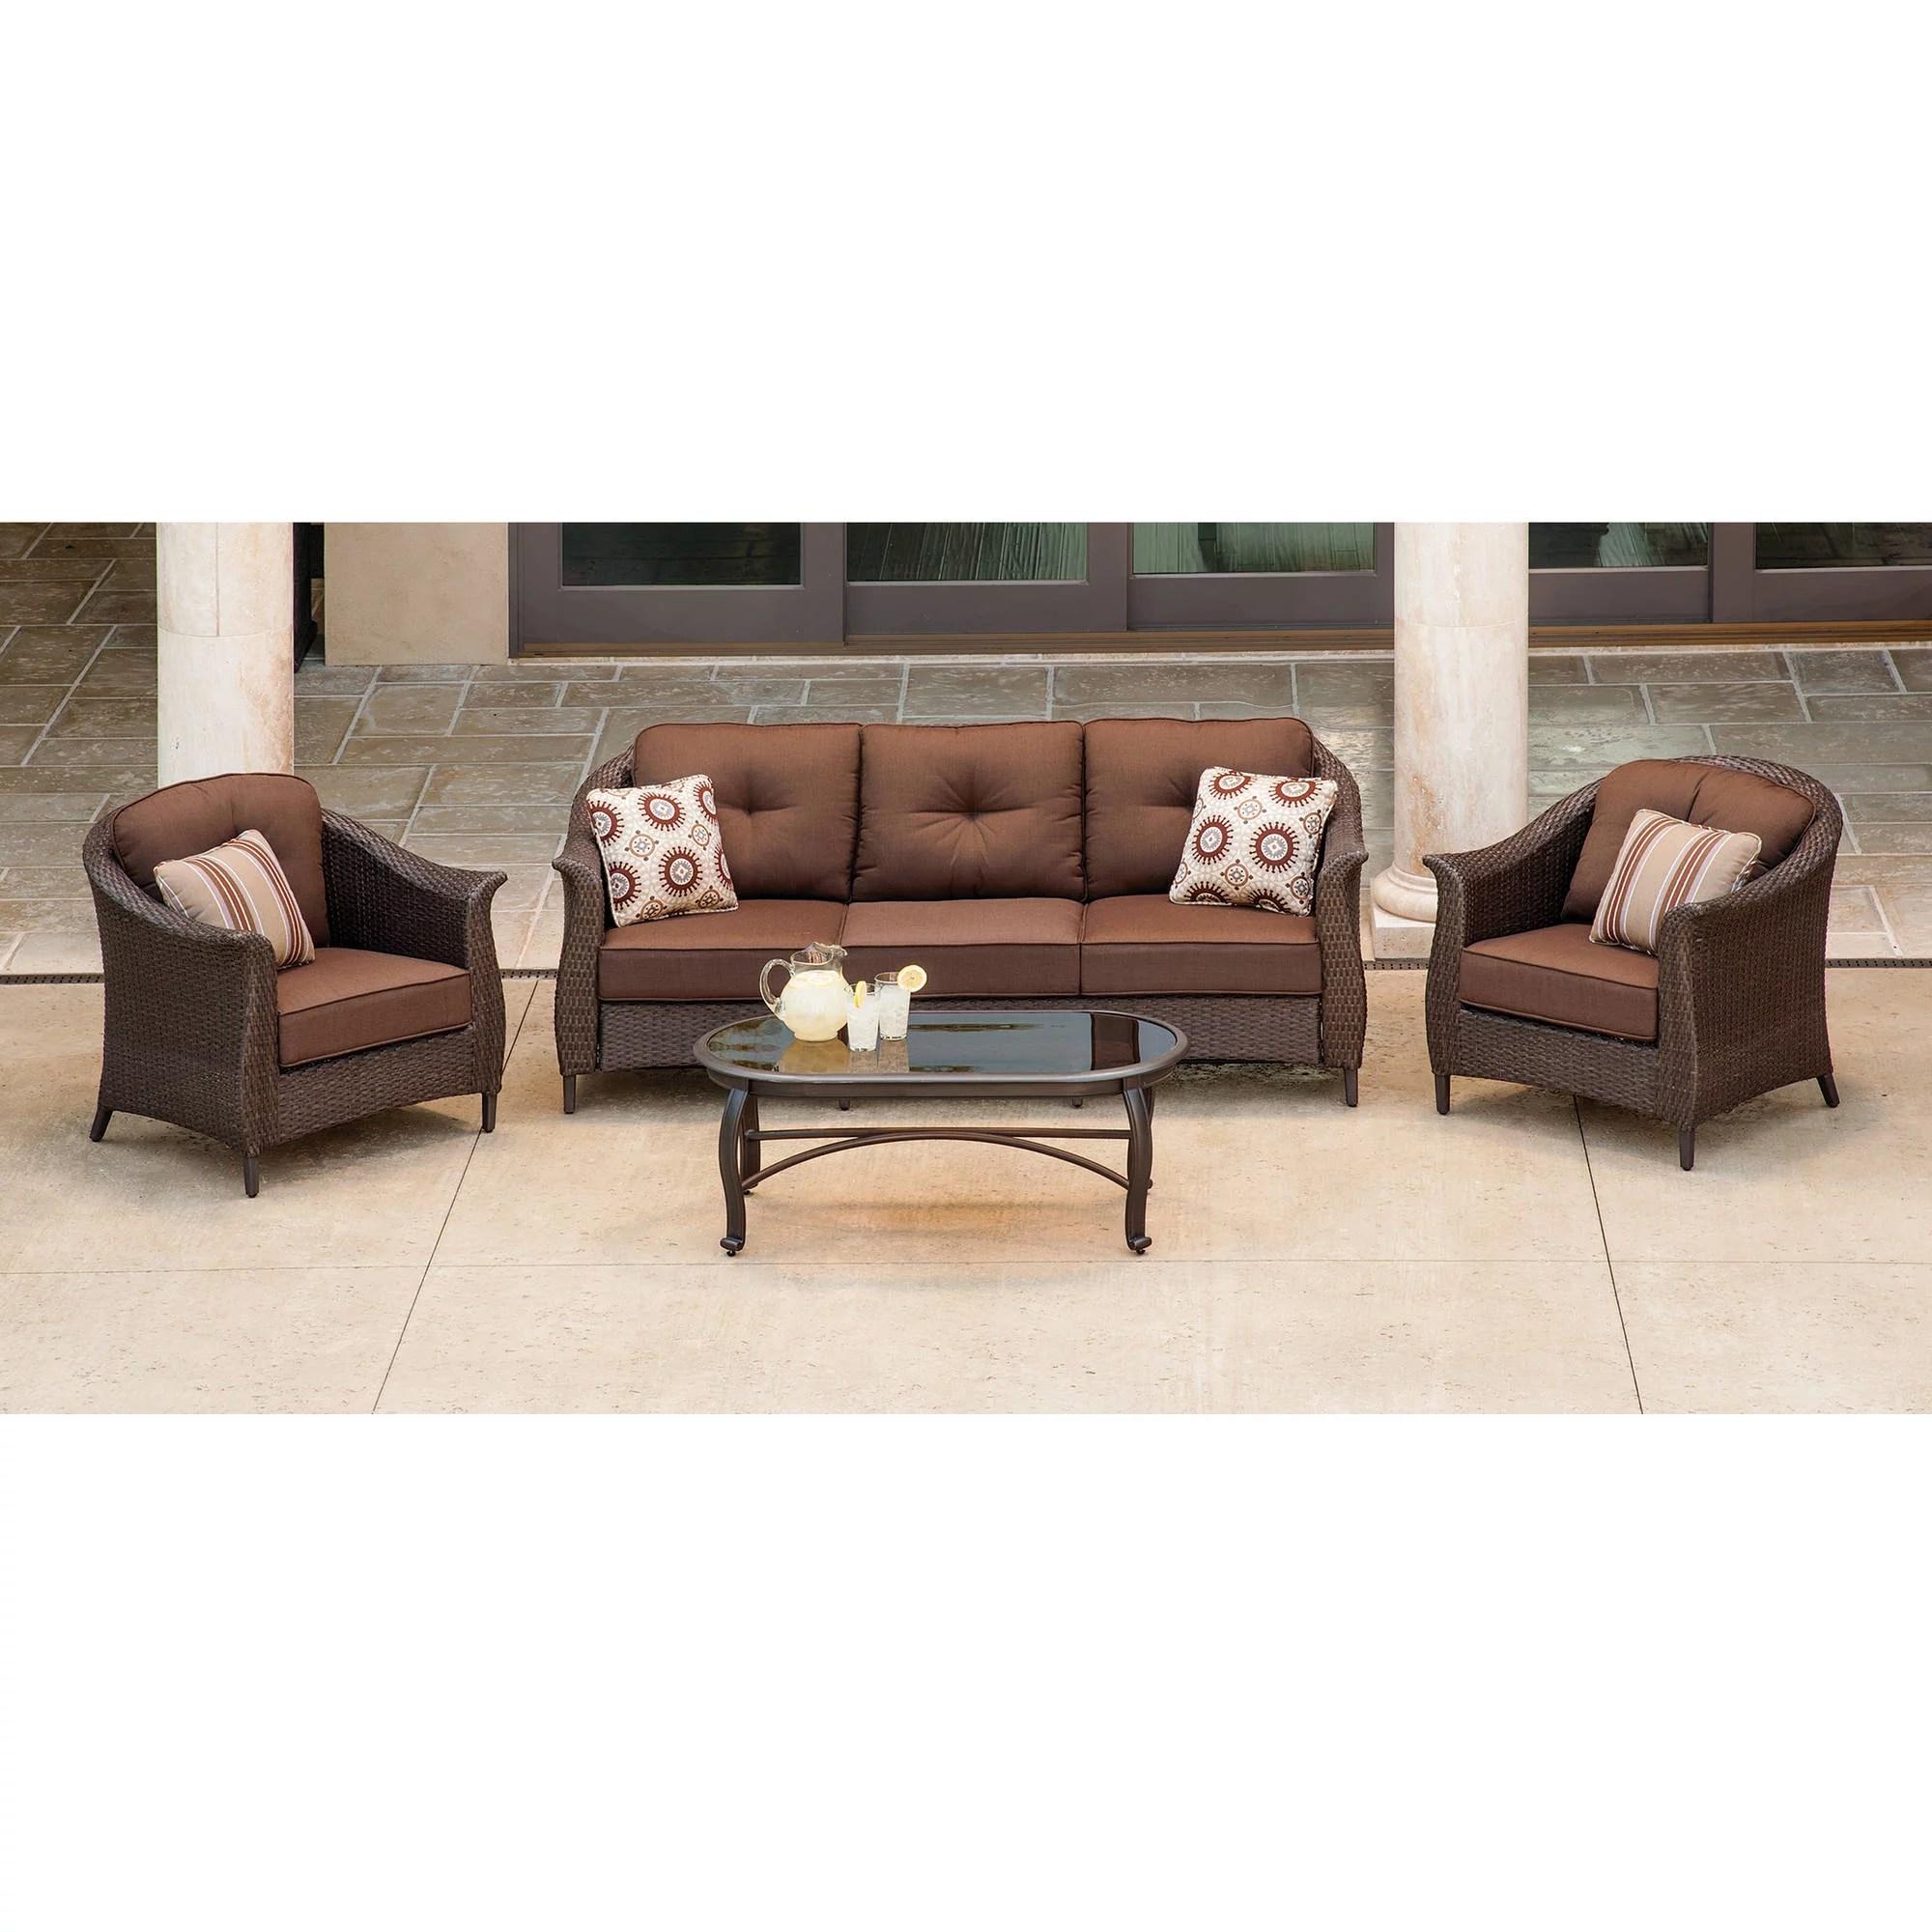 black outdoor sofa leather italia and loveseat 7pc patio garden wicker furniture rattan set